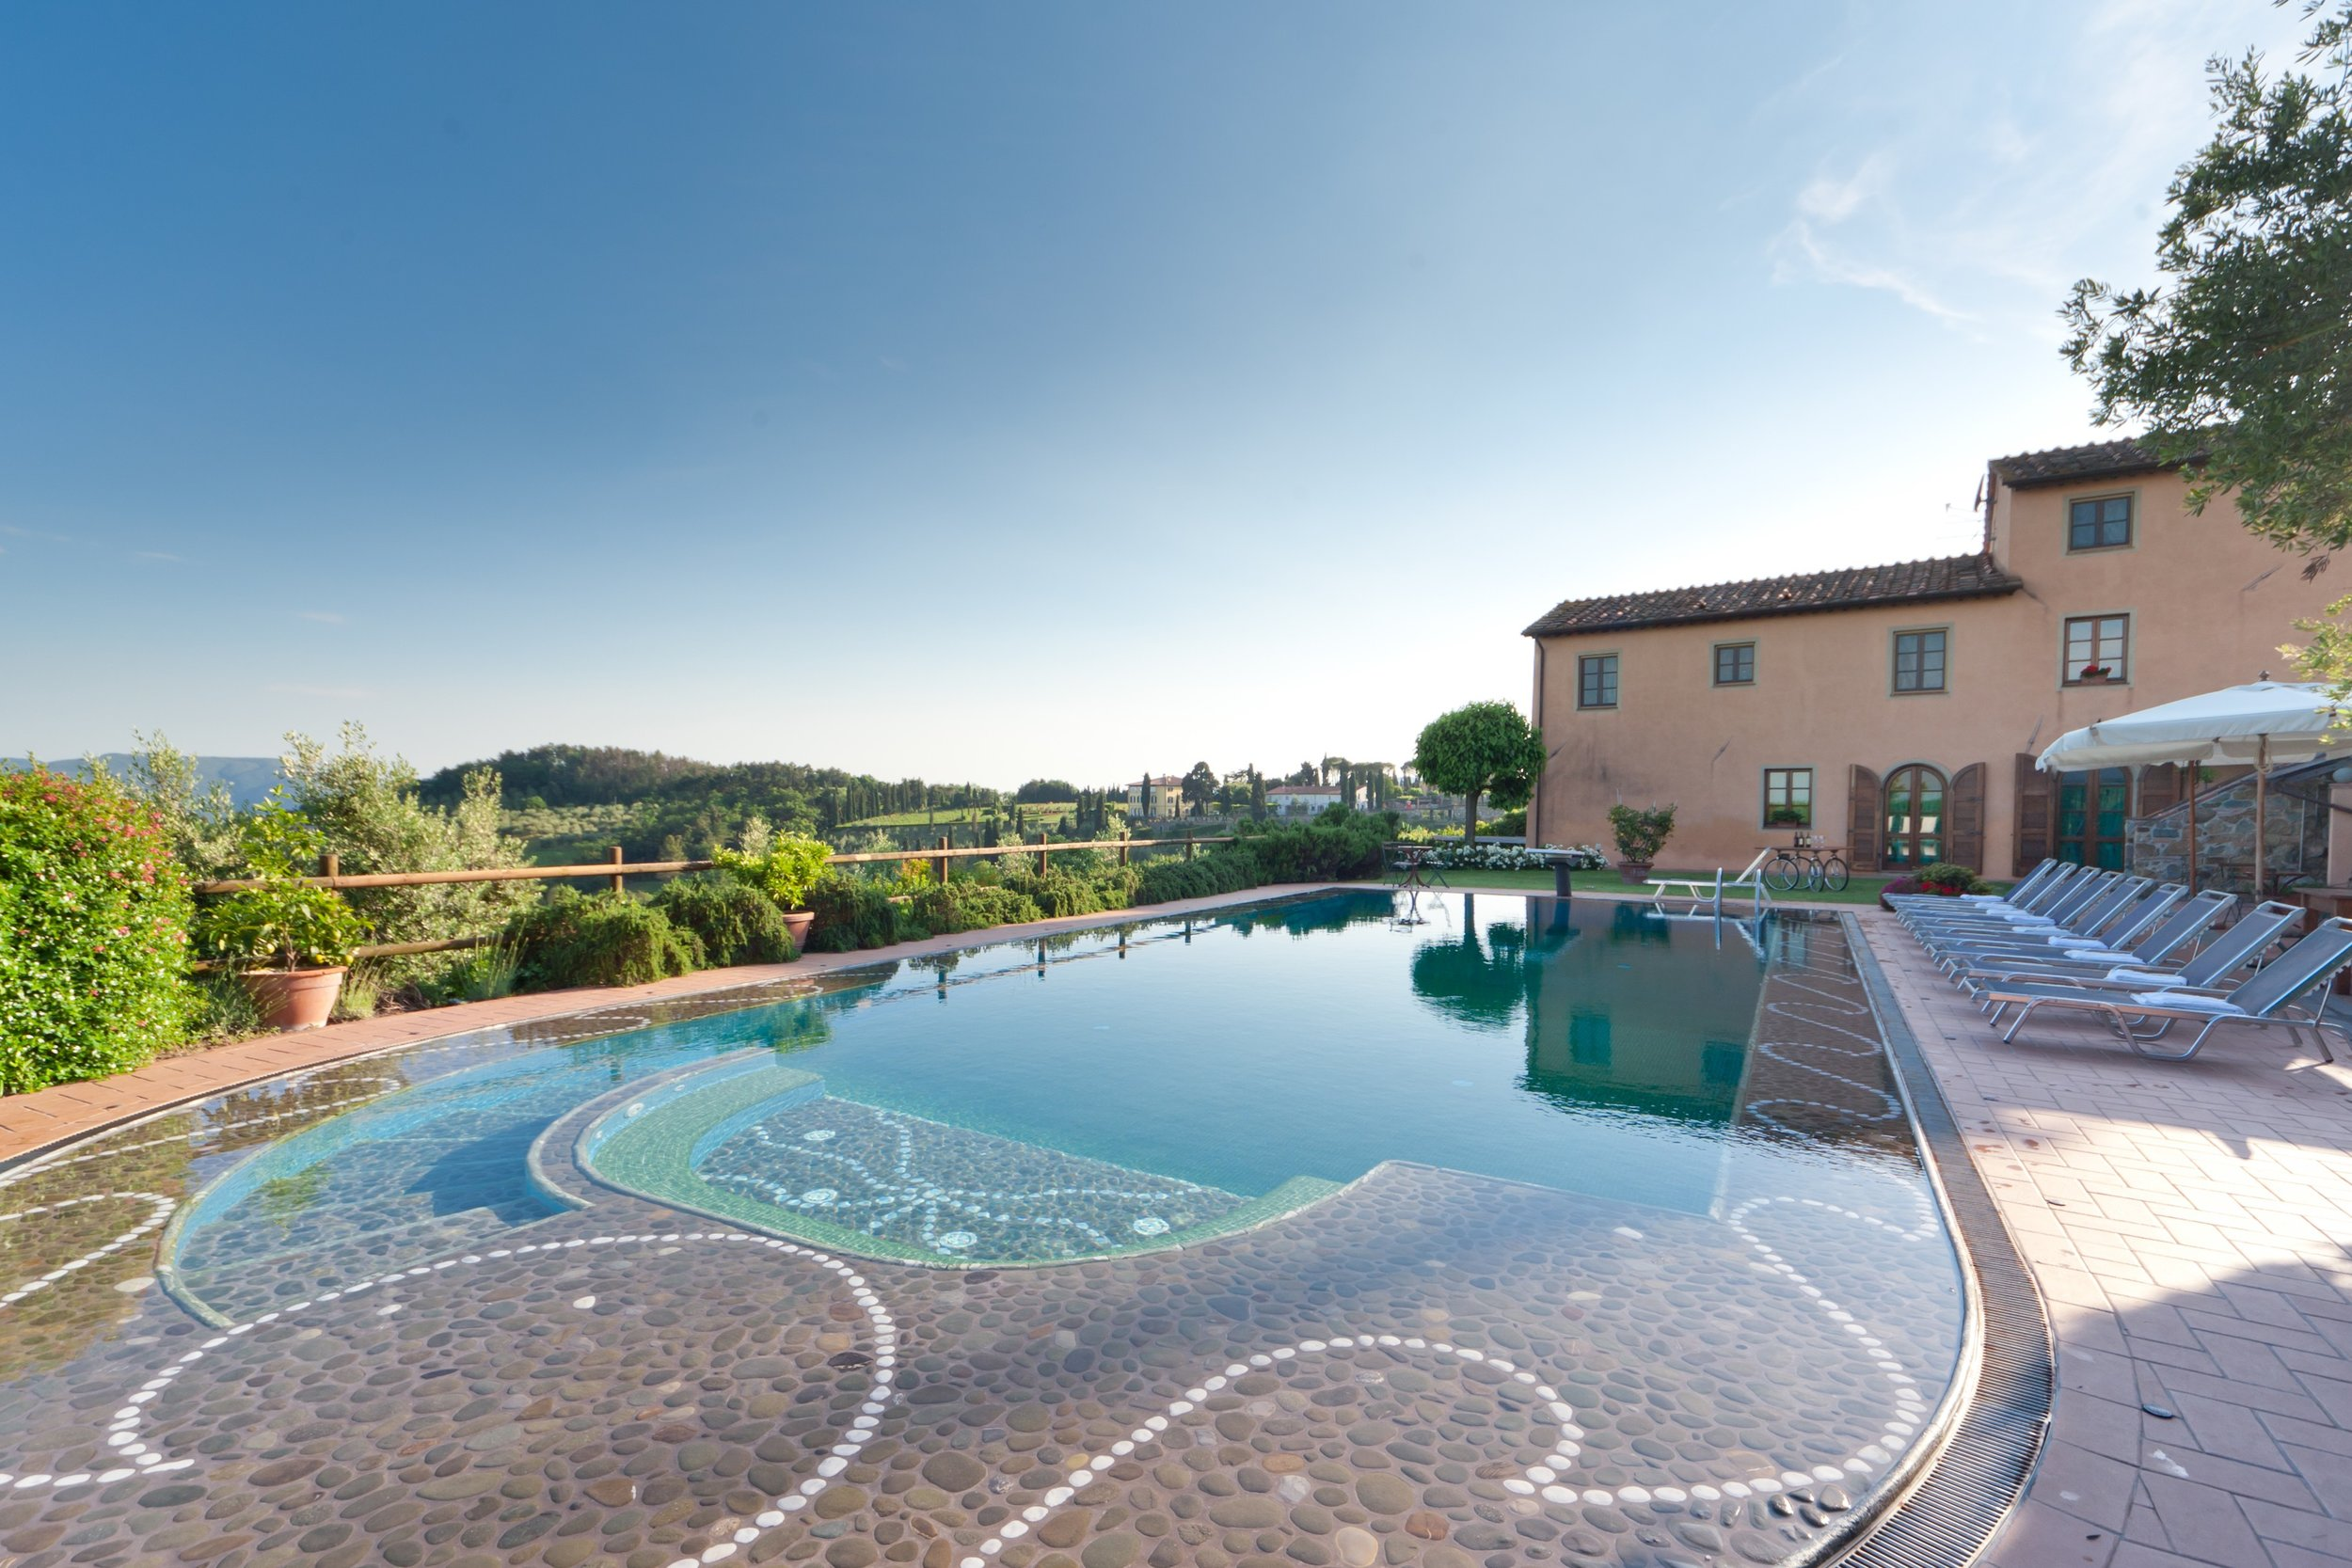 Borghino Swimming Pool 2.jpg